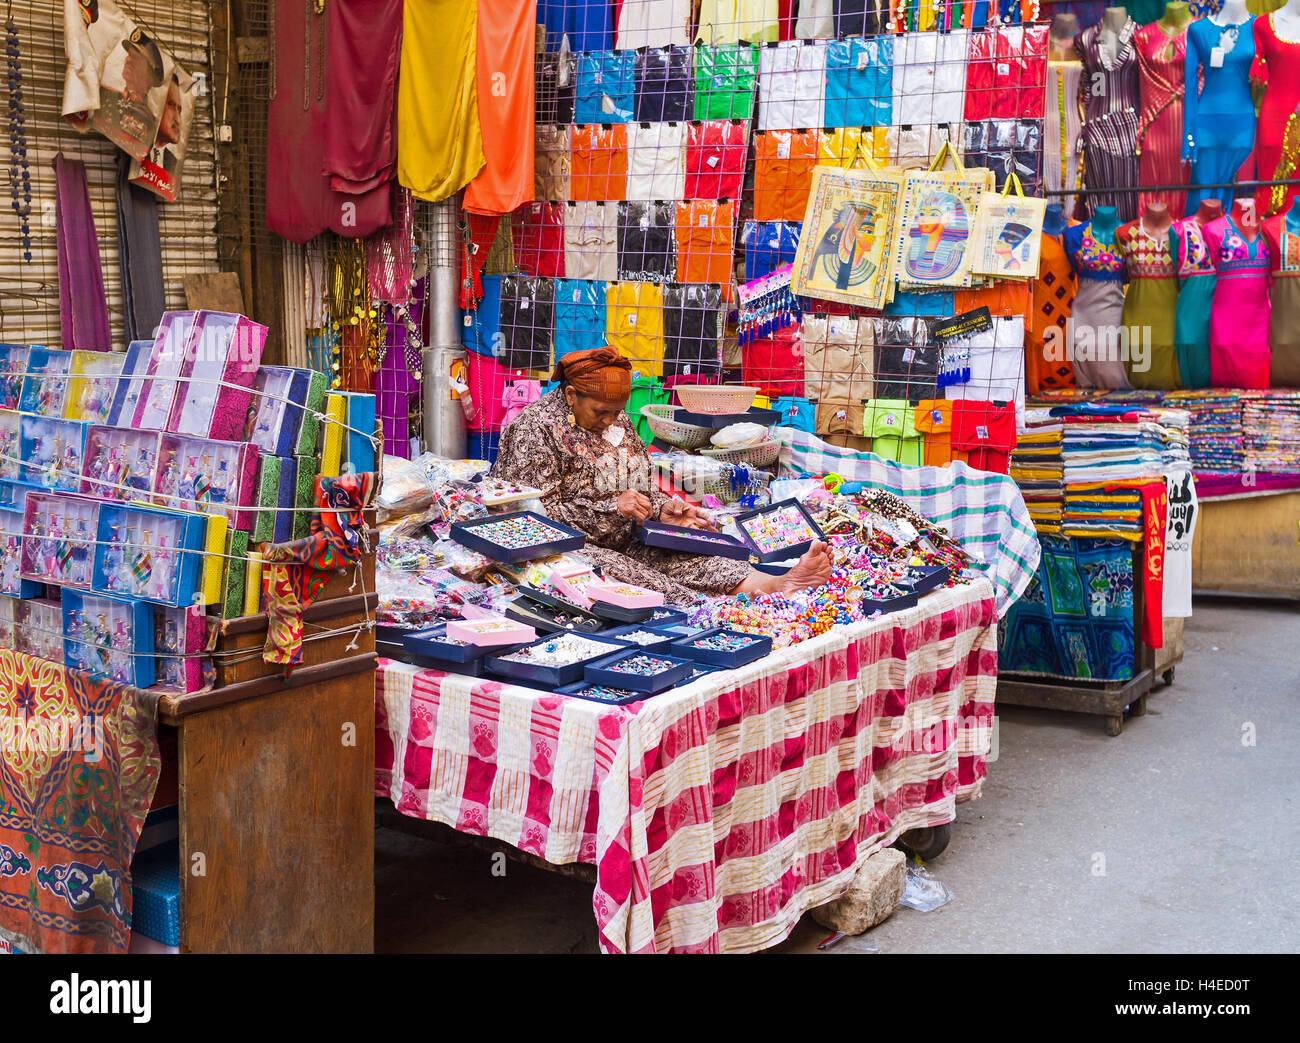 The Khan El-Khalili souq (market) offers goods on each taste and